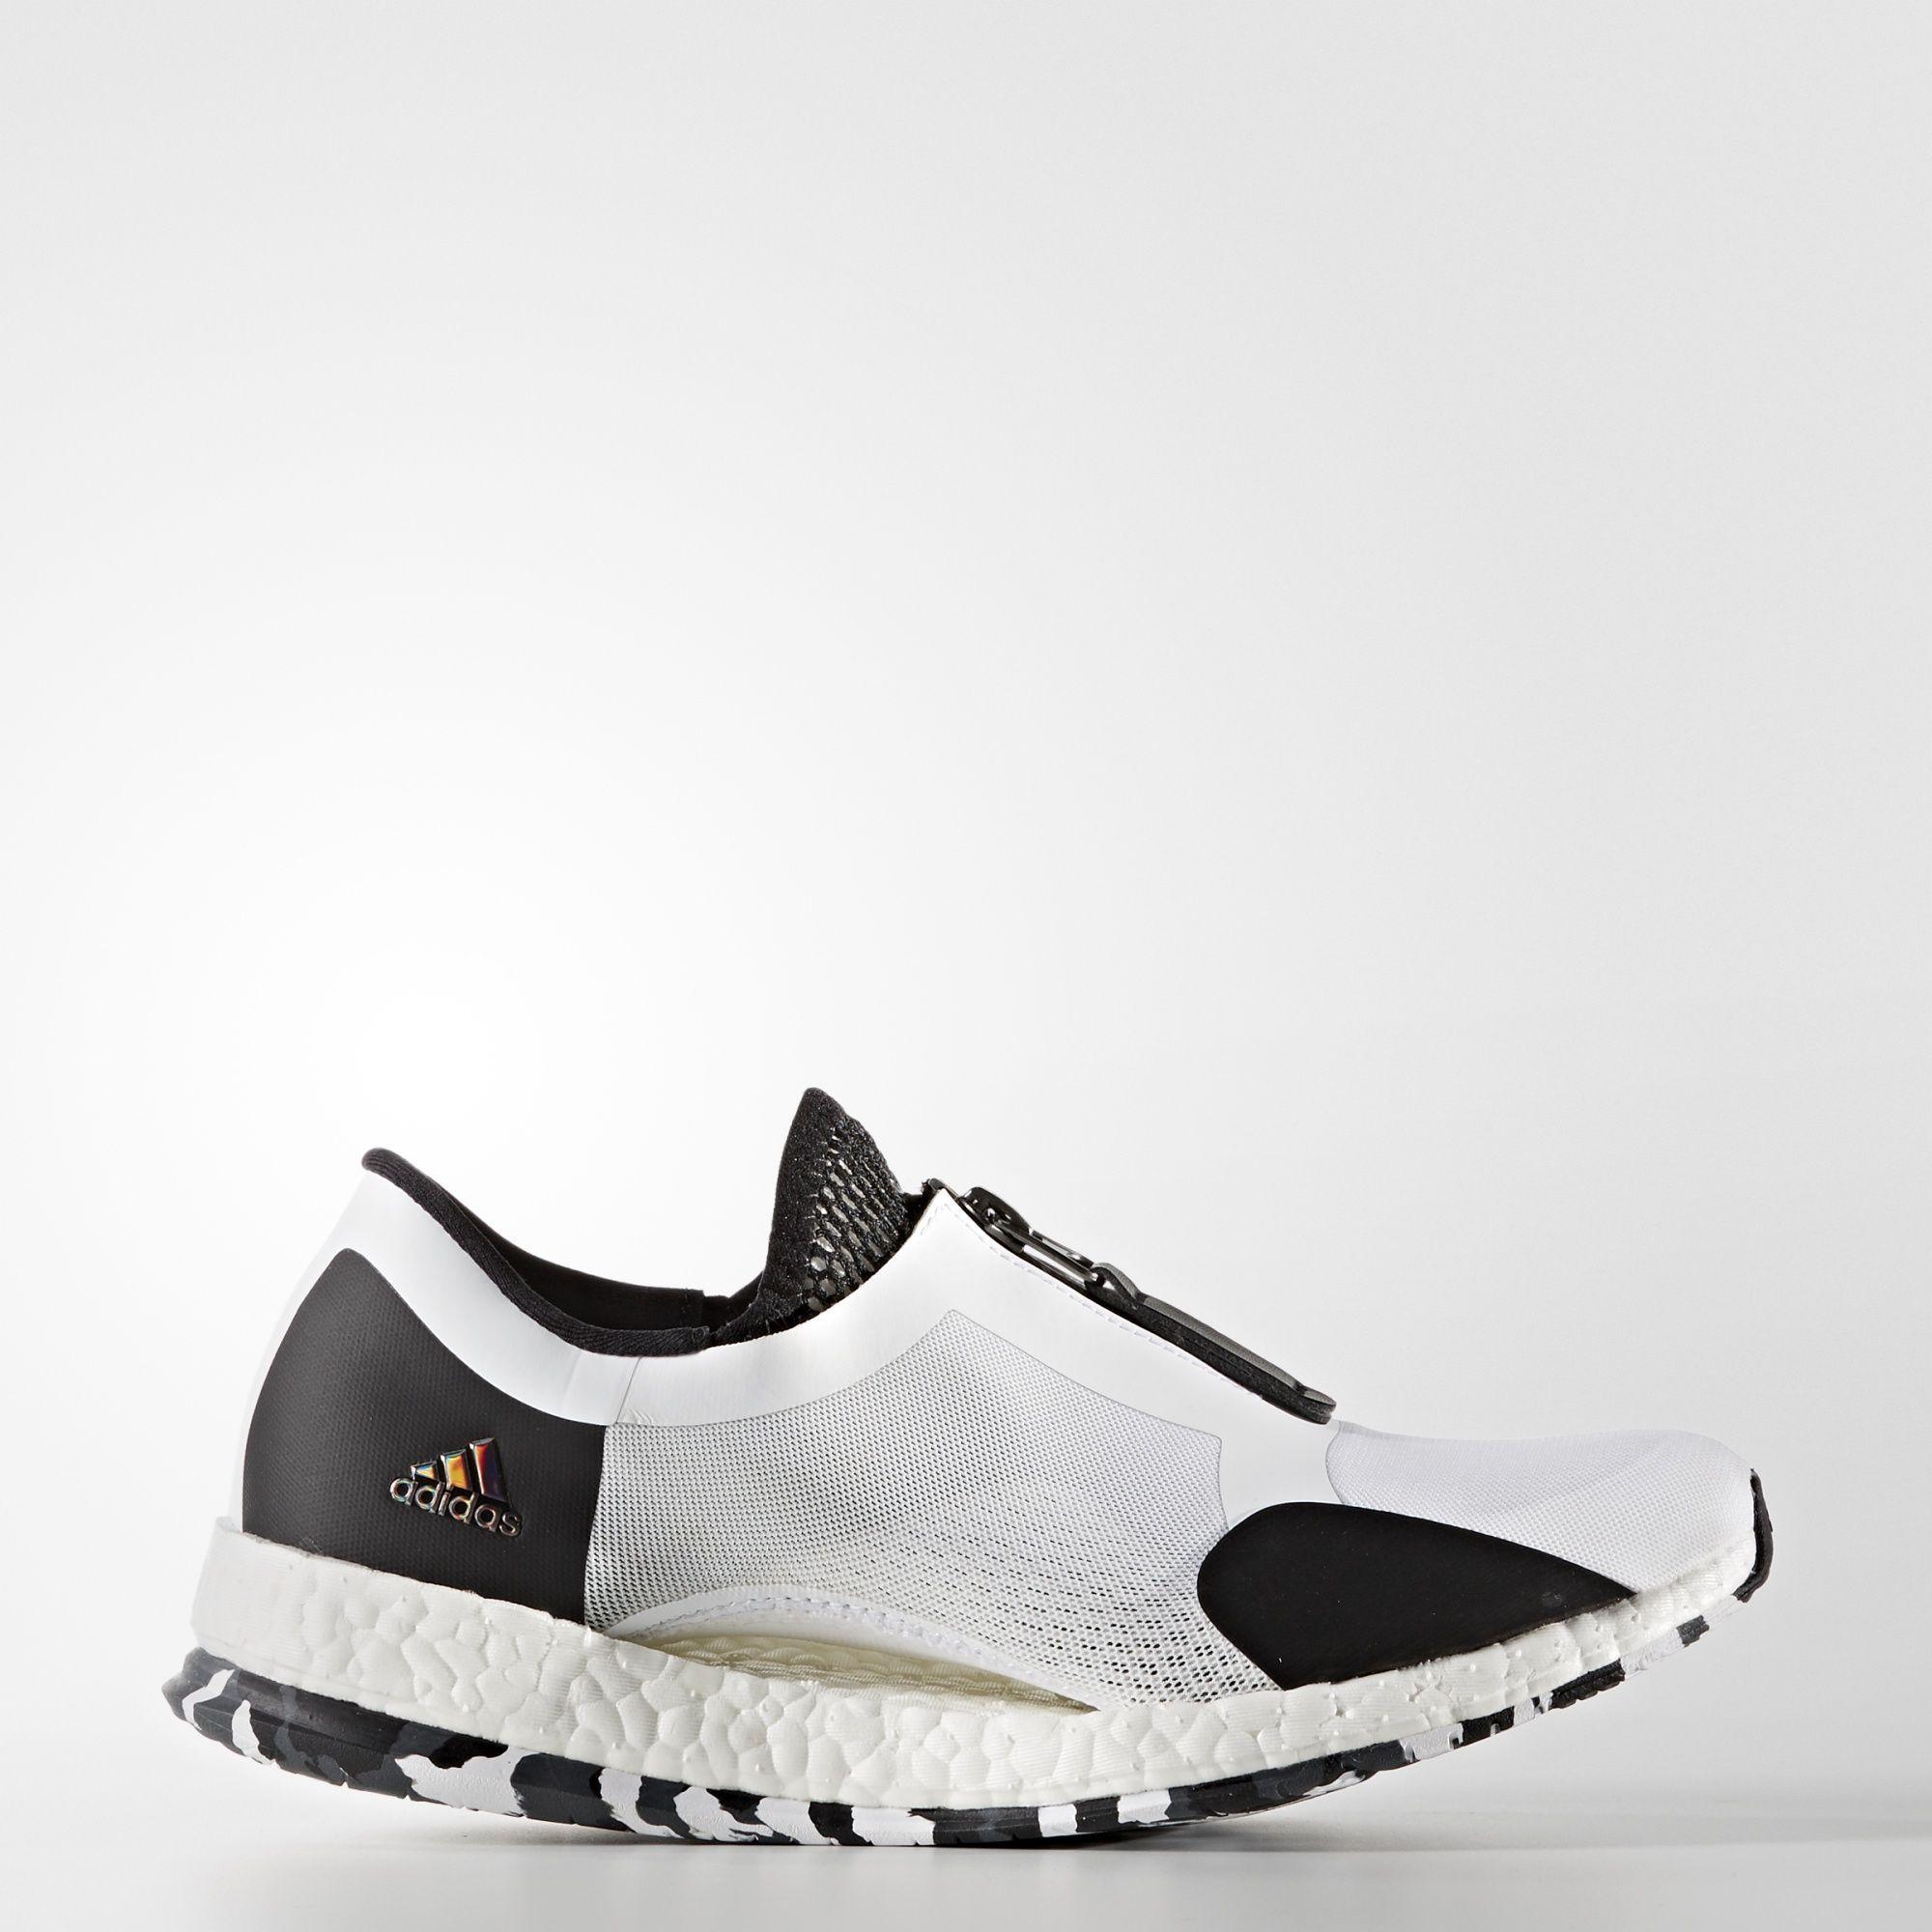 e2400f0decb99 adidas - PureBOOST X Trainer Zip Shoes